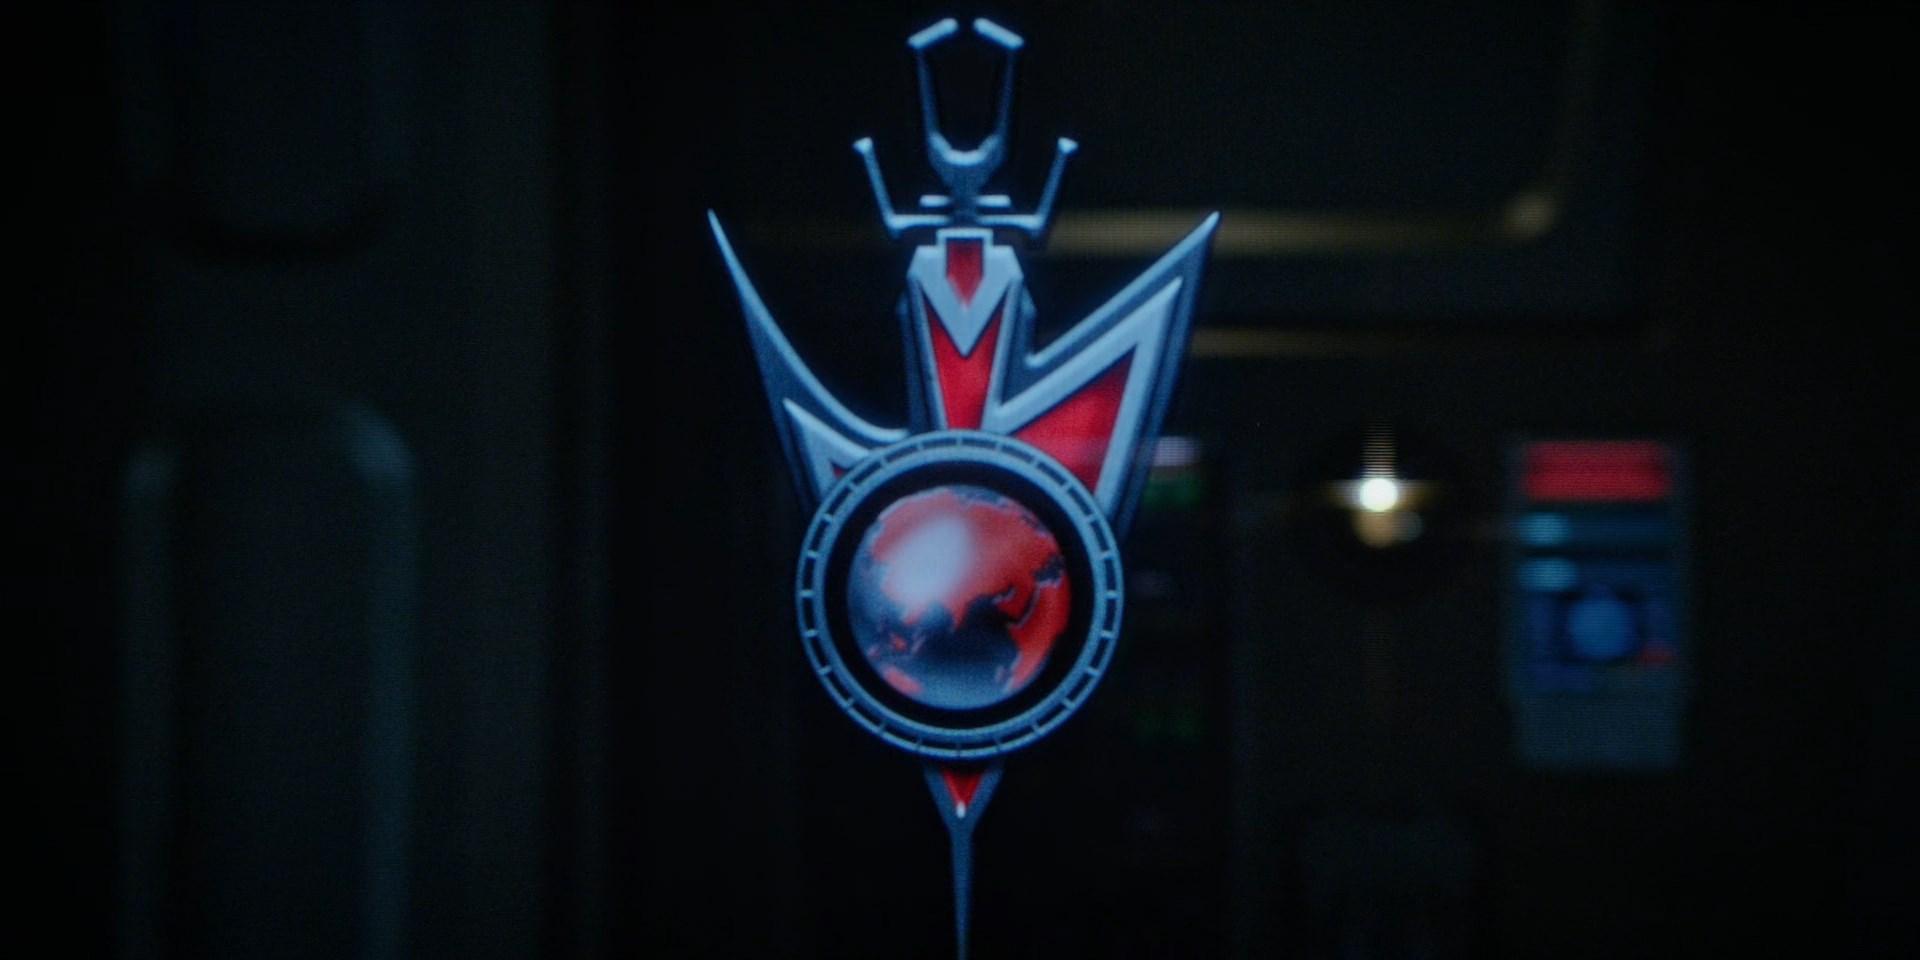 epizodleiras_1x10_2.jpg